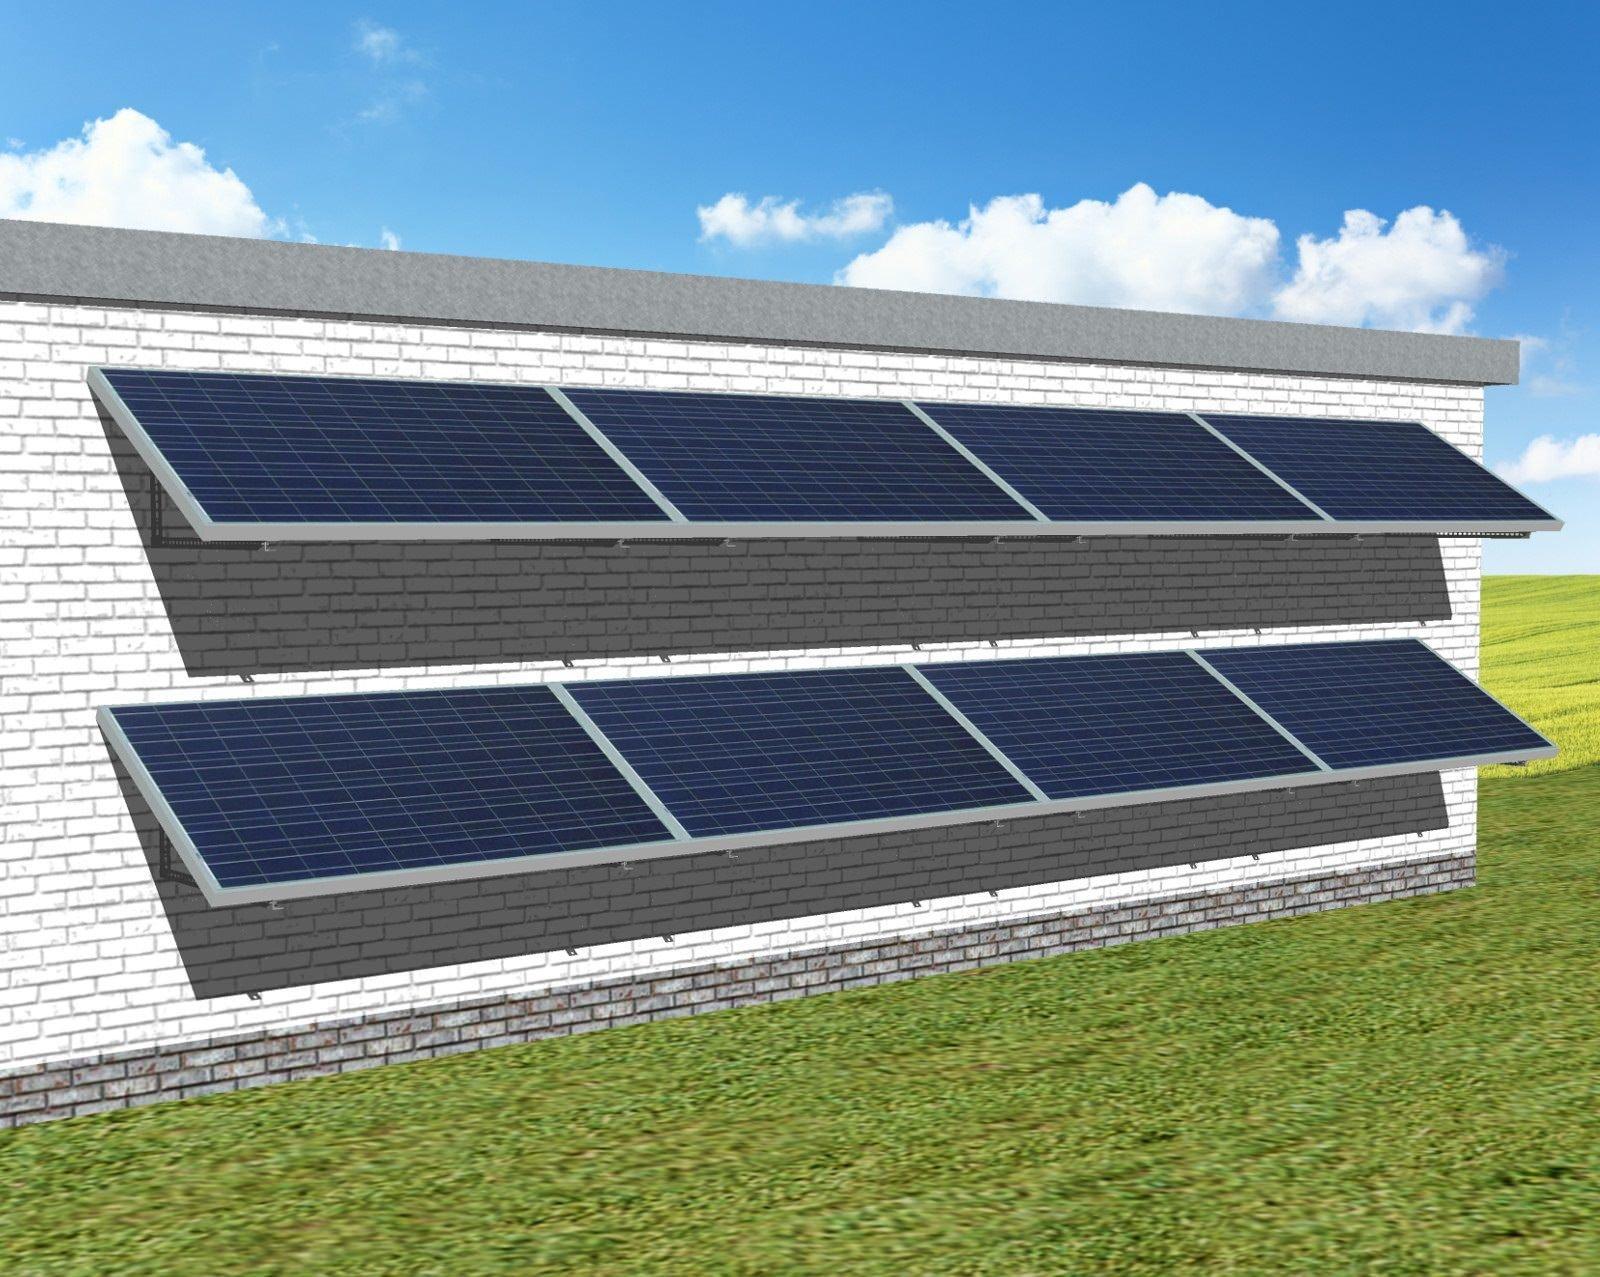 myCleantech-Solar.org Solaranalage Fassade oder Carport mit 8 Pannels